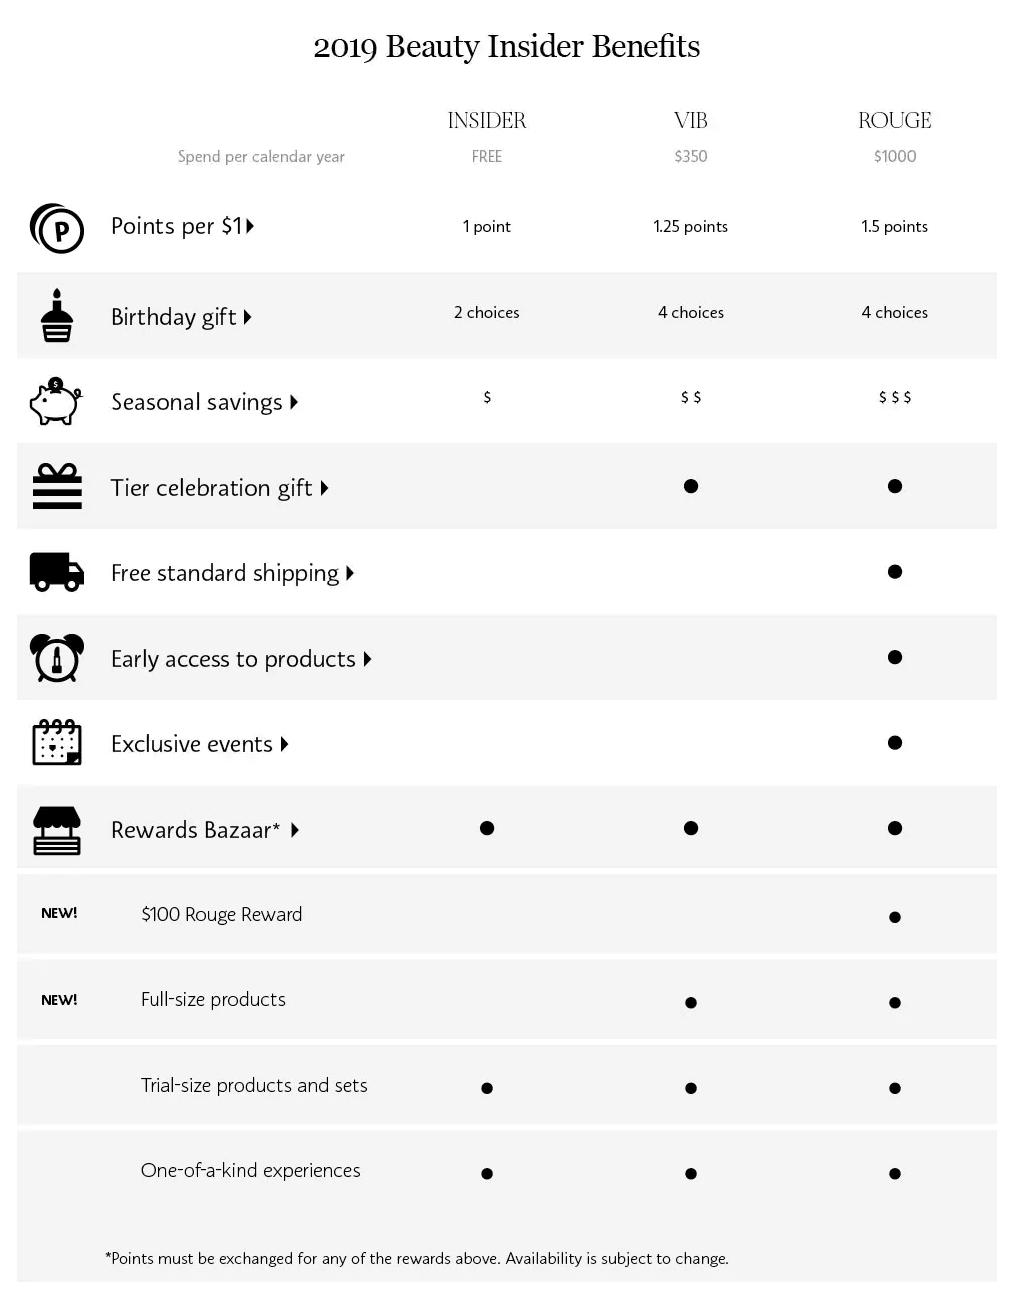 luxury brands - sephora tiers